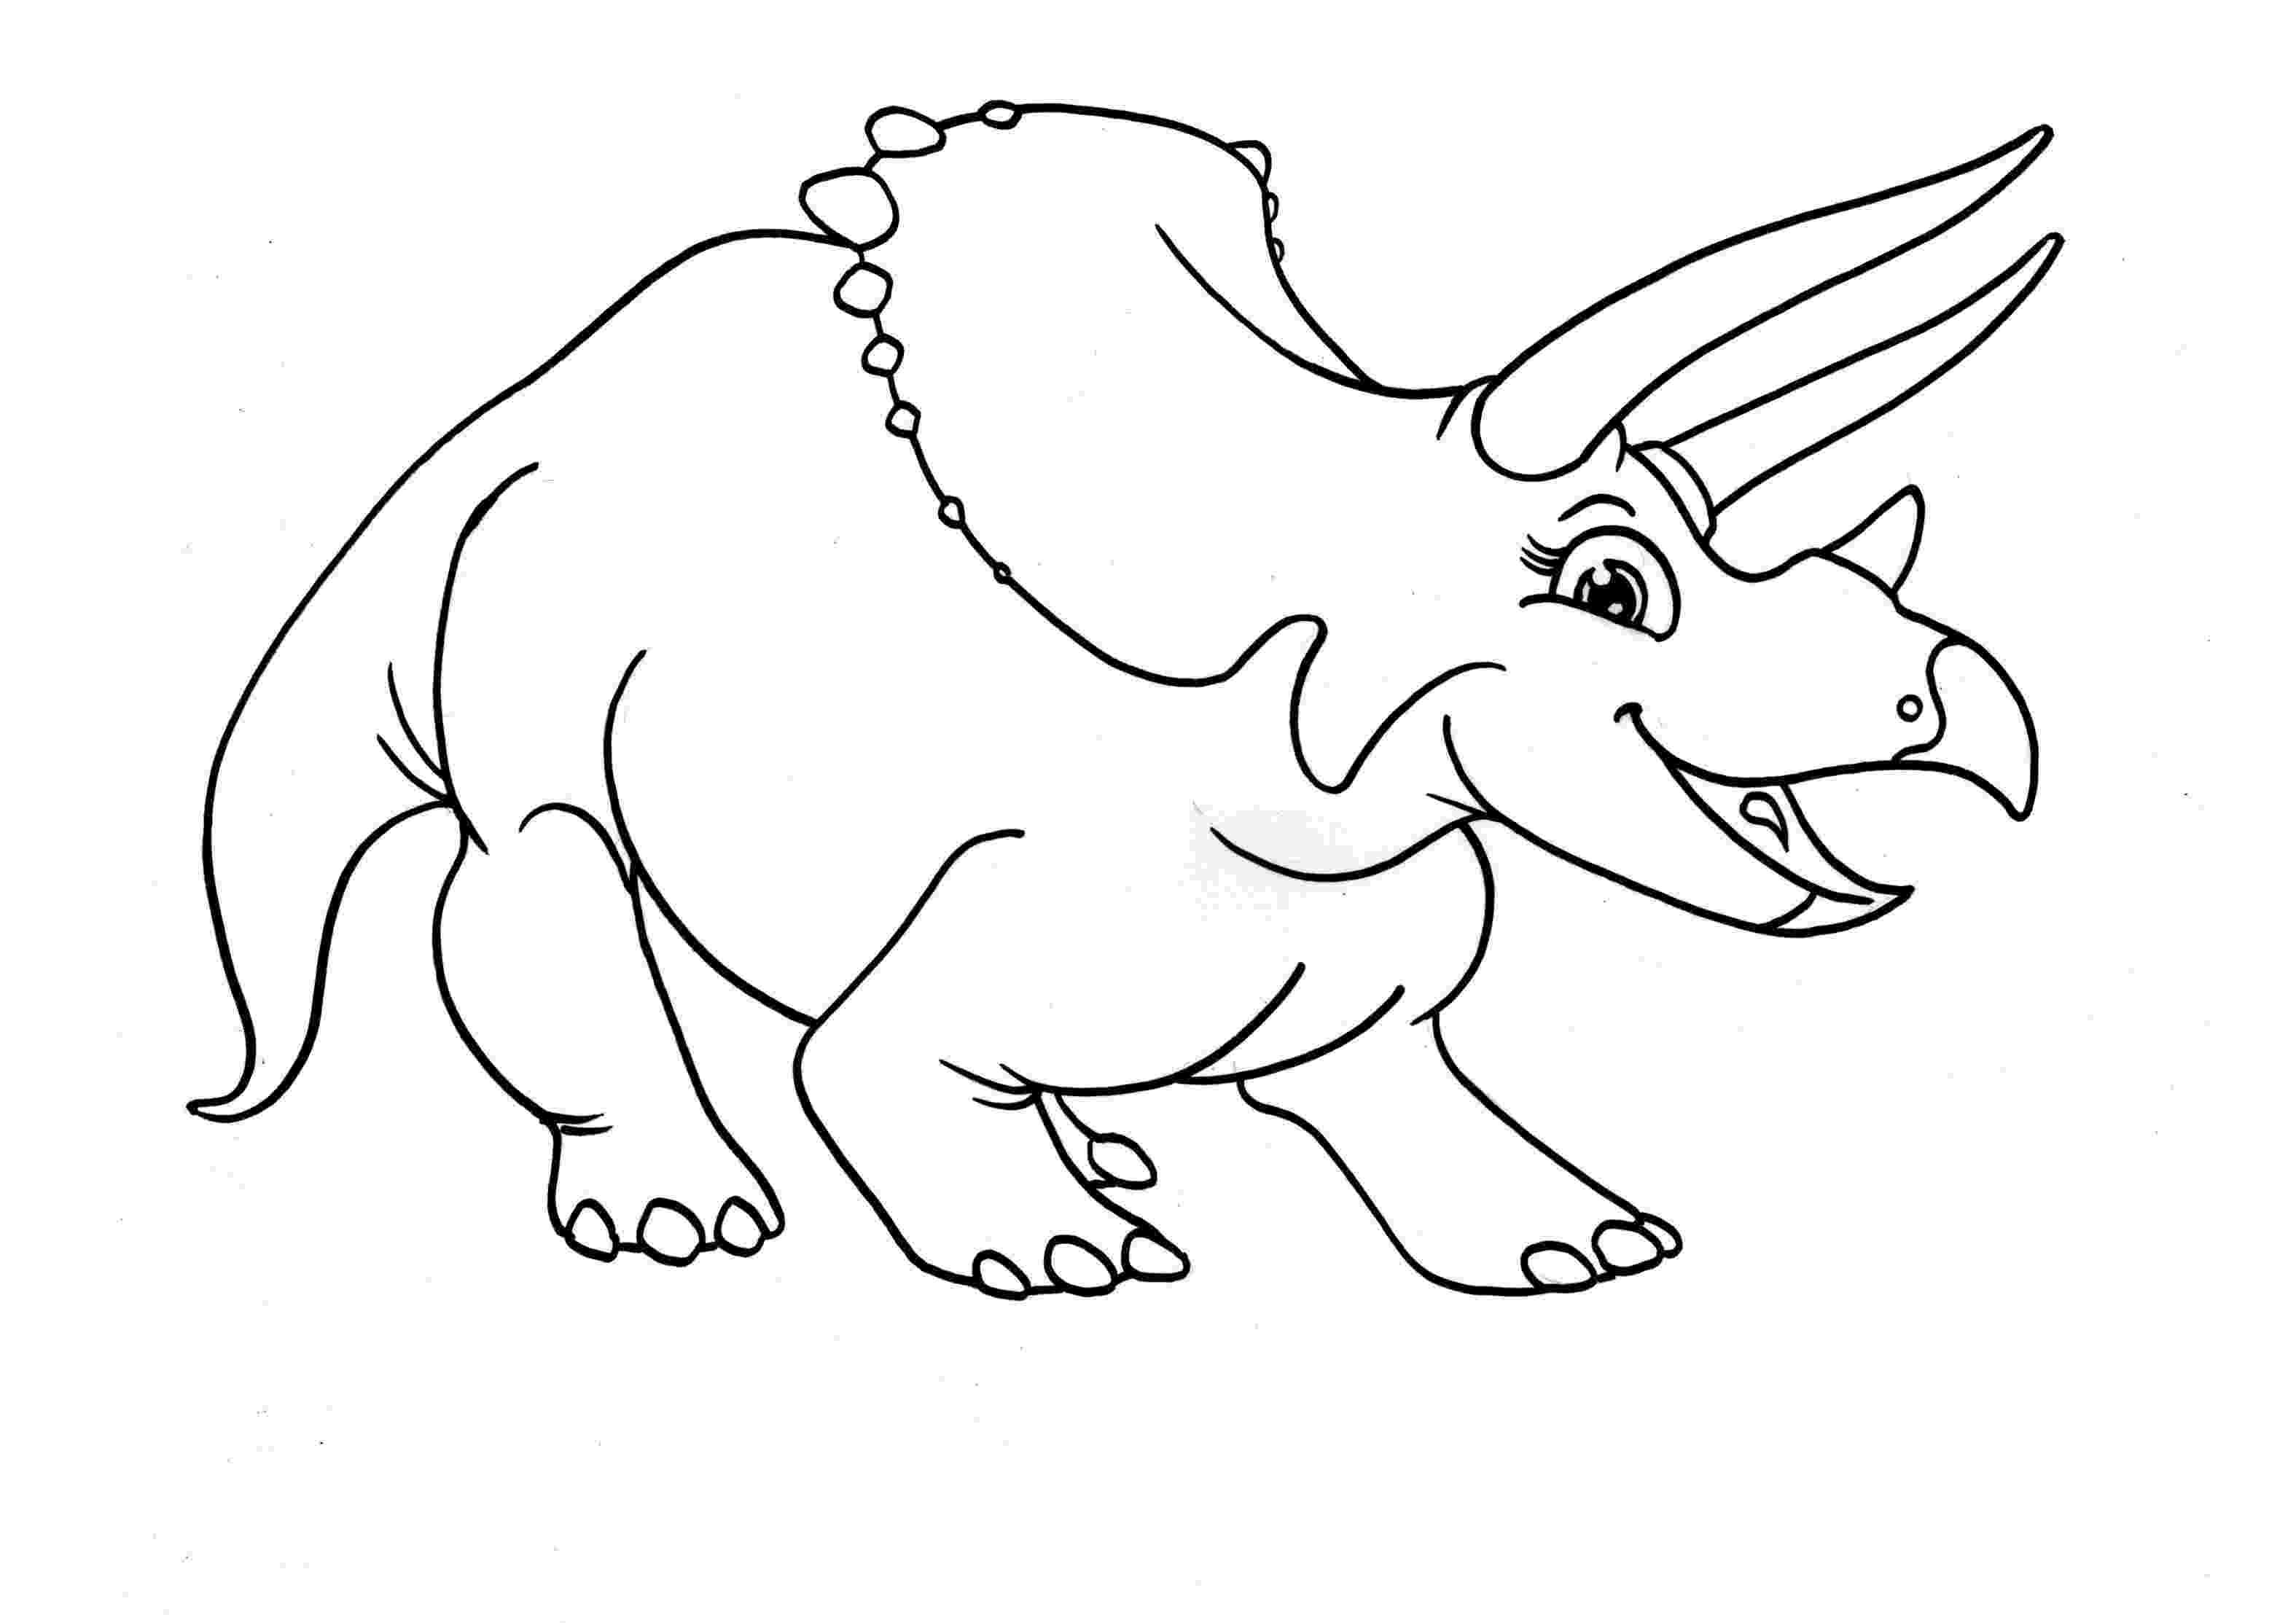 free dinosaur printables free dinosaur printable coloring pages coloring home free dinosaur printables